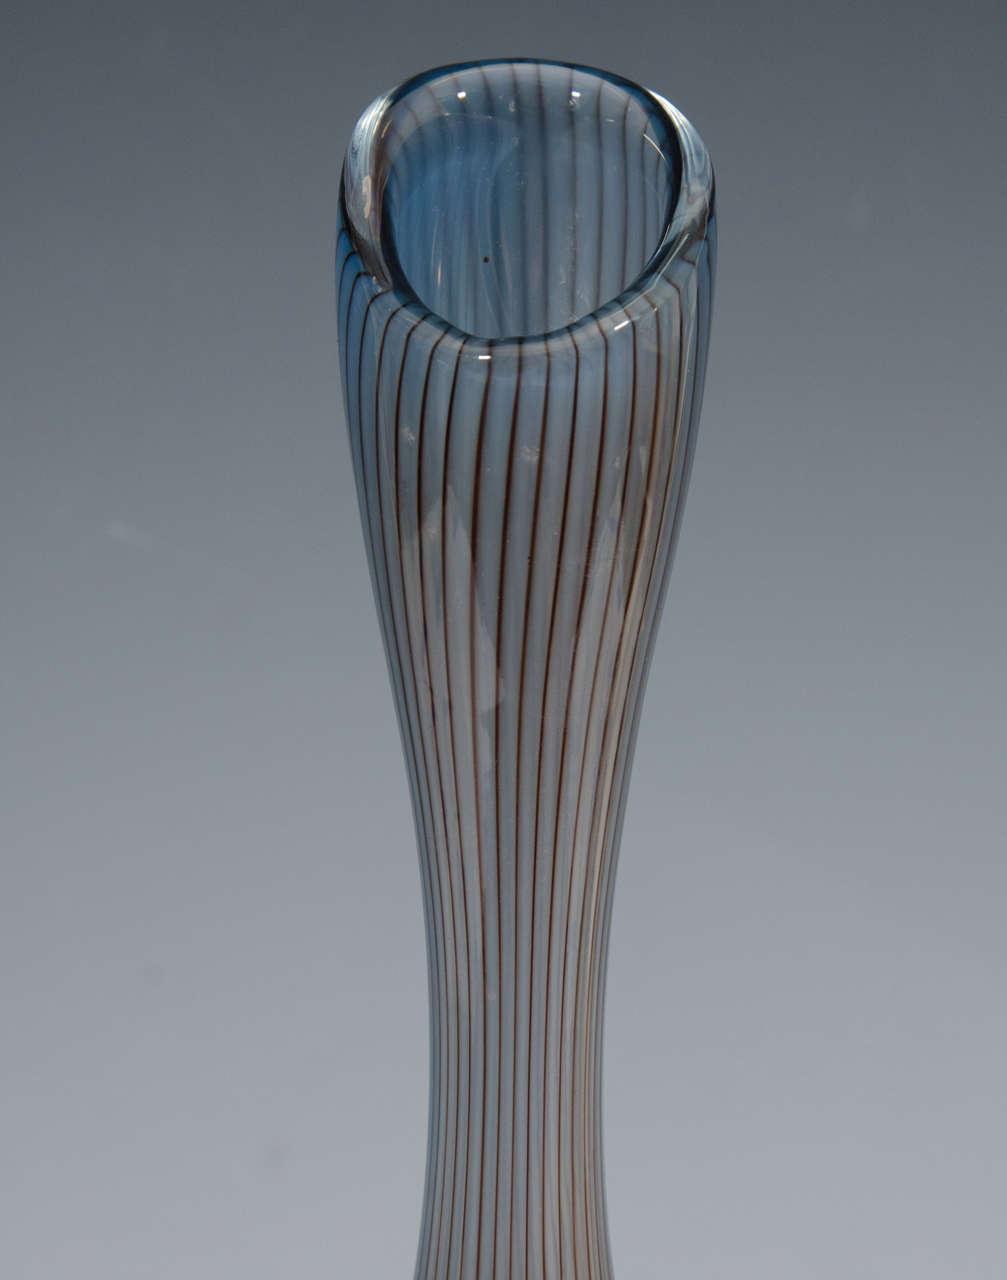 Midcentury Kosta Swedish Colors Art Glass Bud Vase